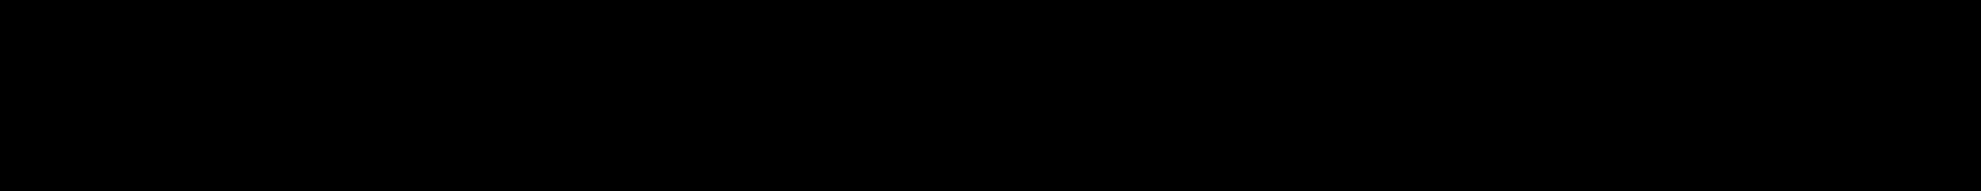 Design System C 500I